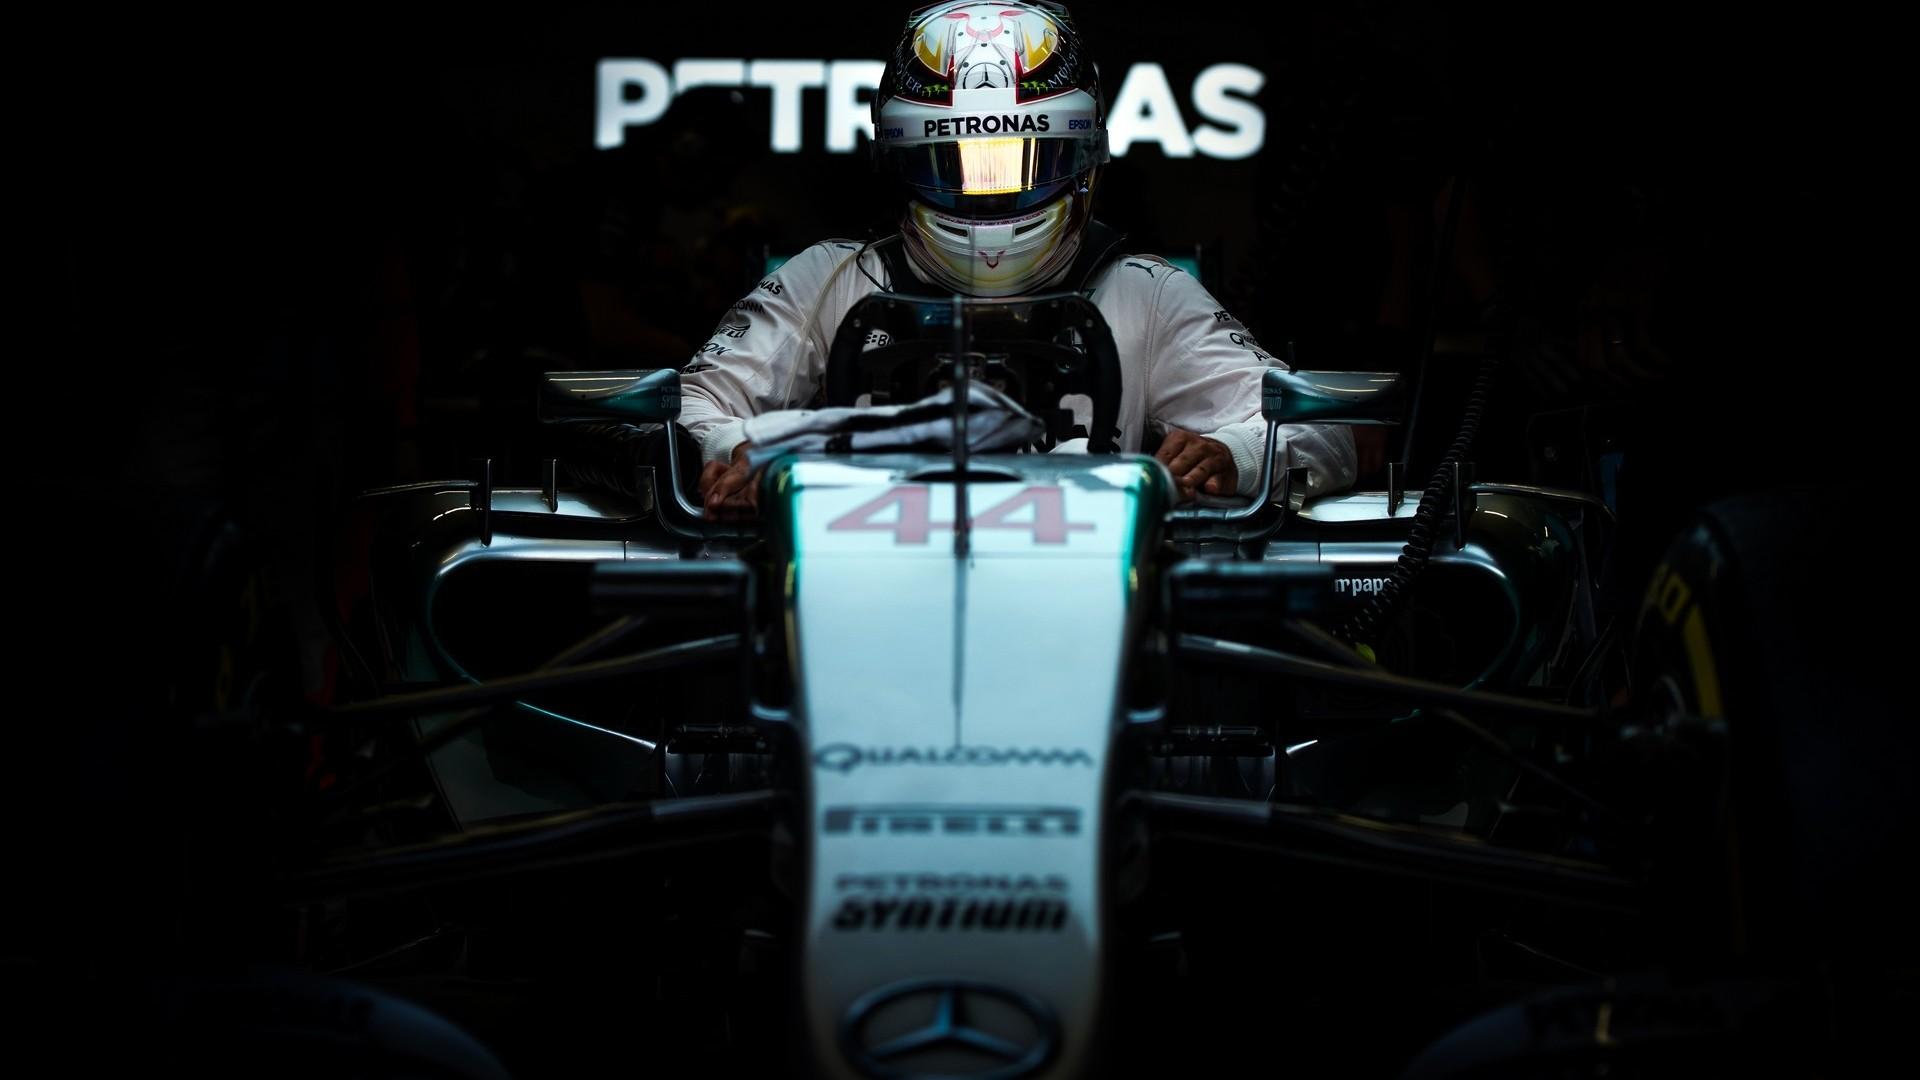 1920x1080 Px 1 Lewis Hamilton Mercedes Benz